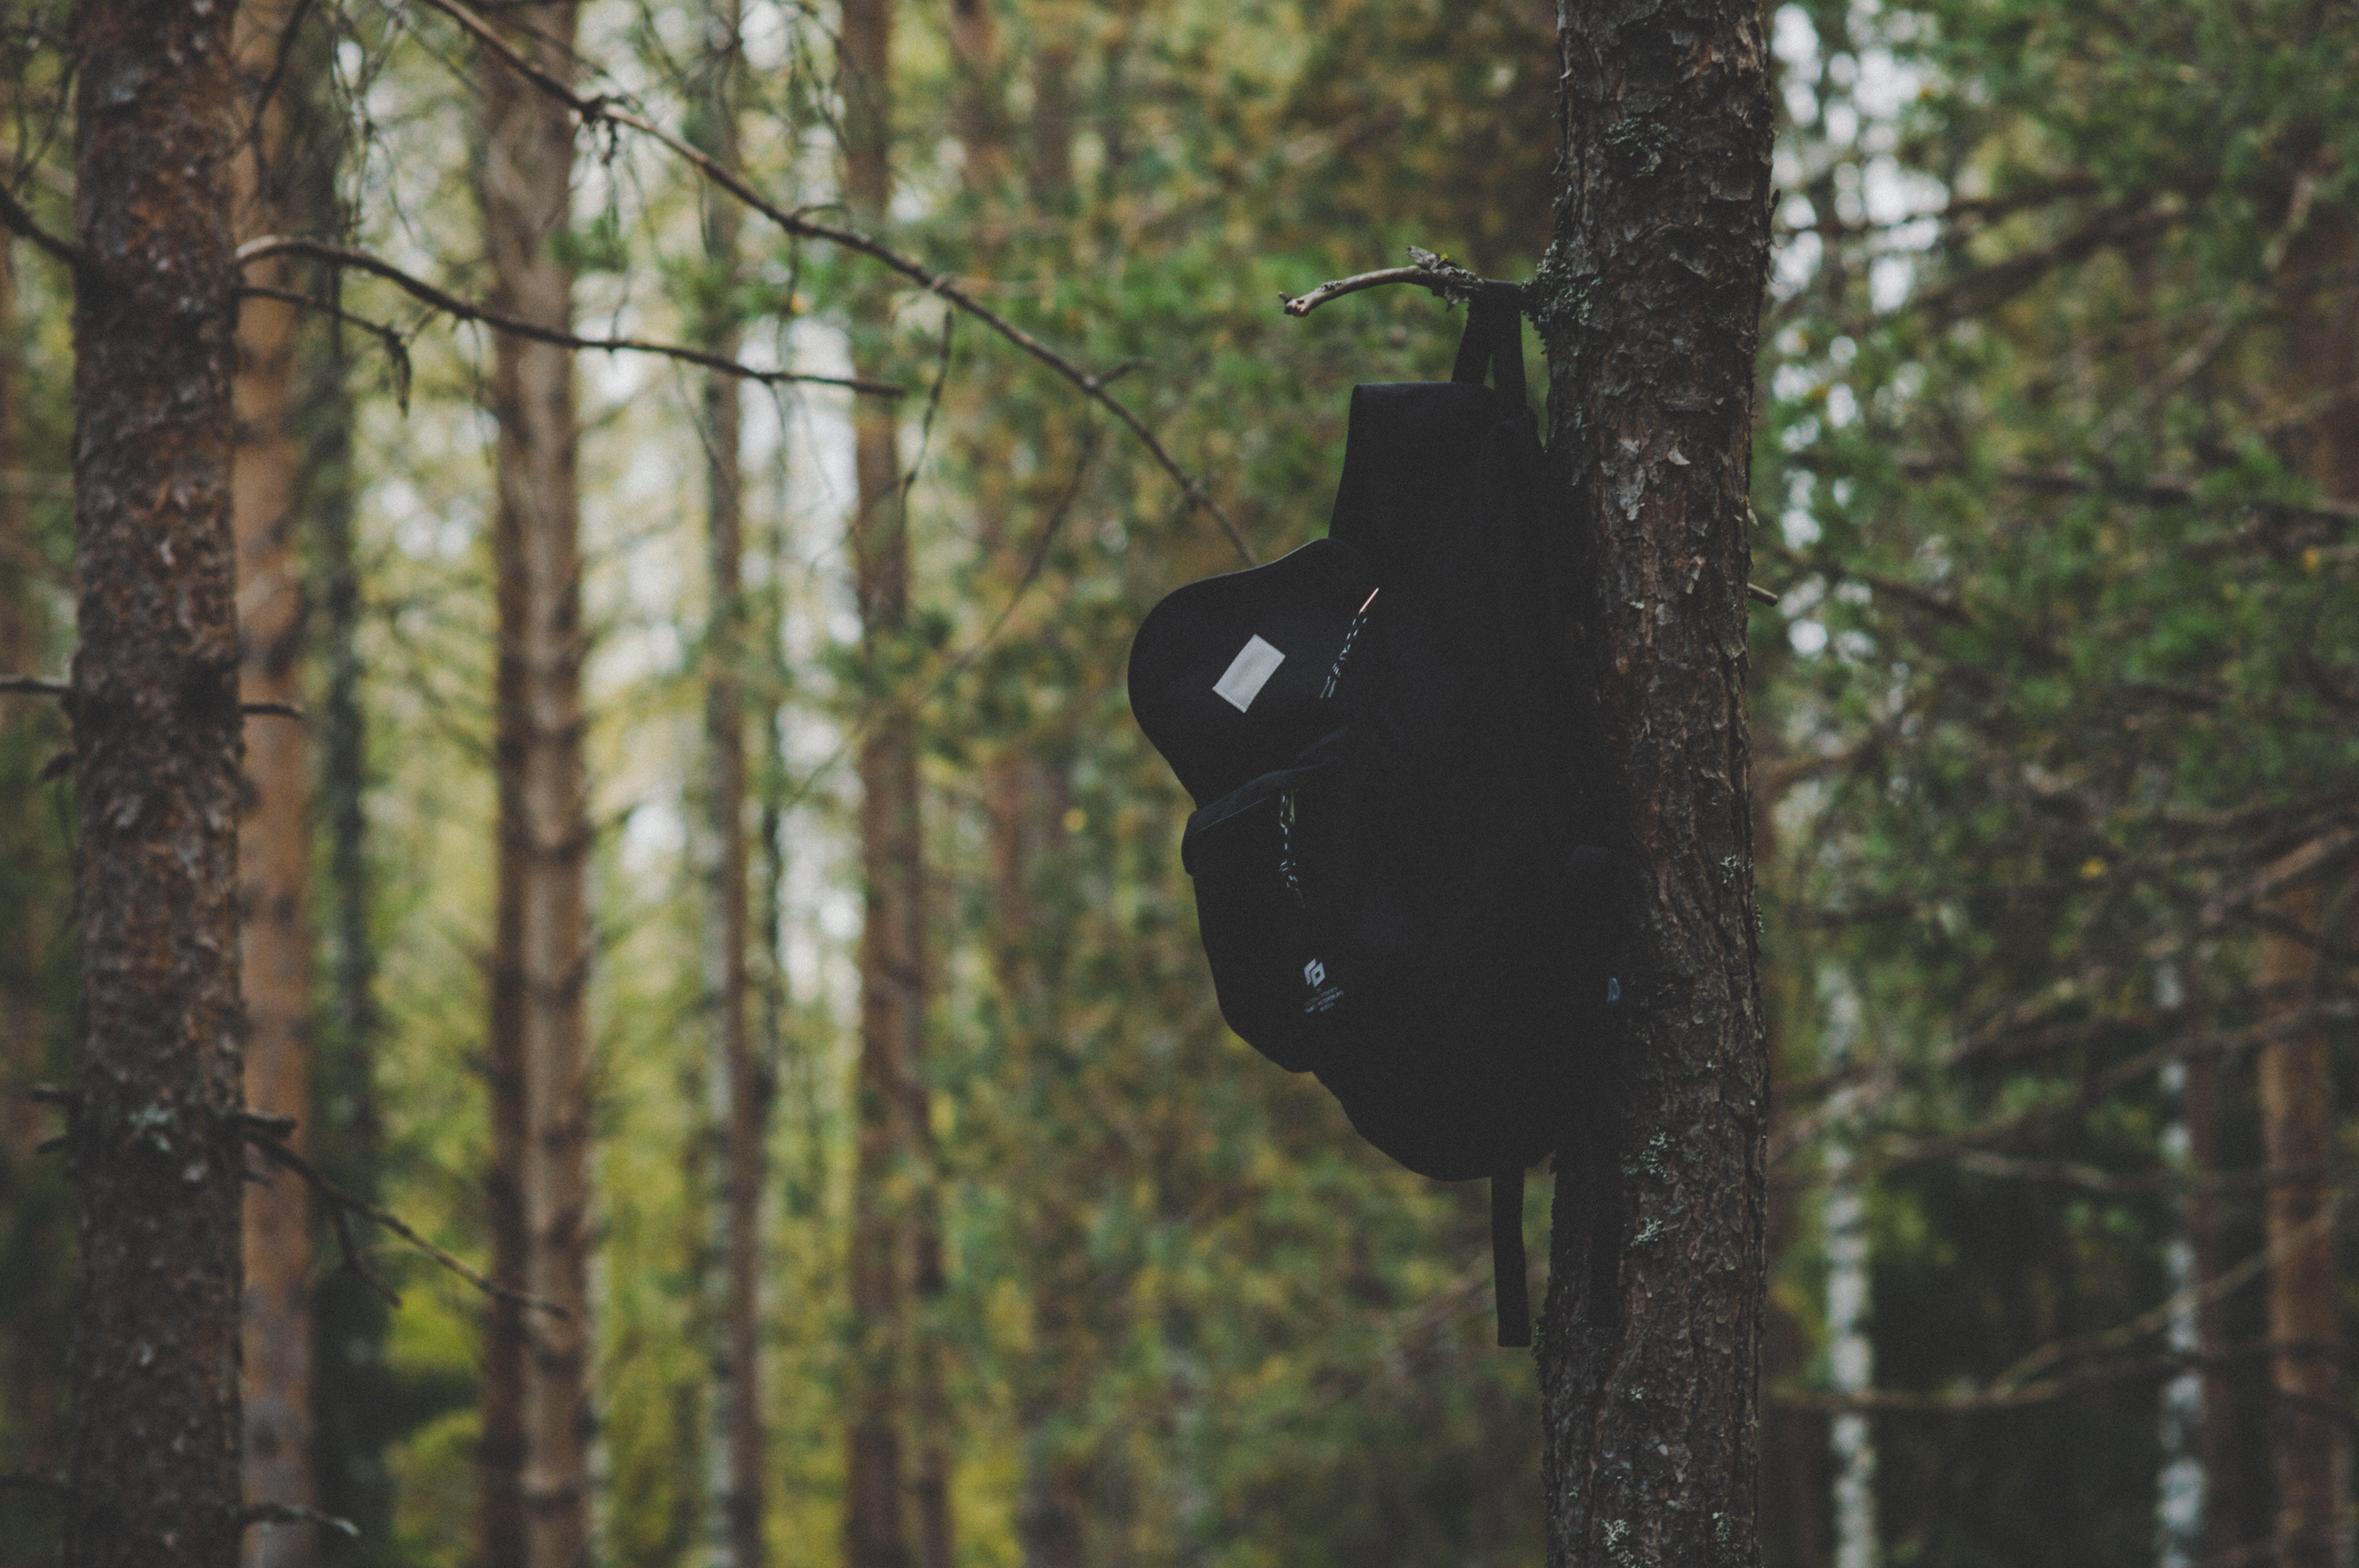 Gratis arkivbilde med bark, dagslys, fokus, grener